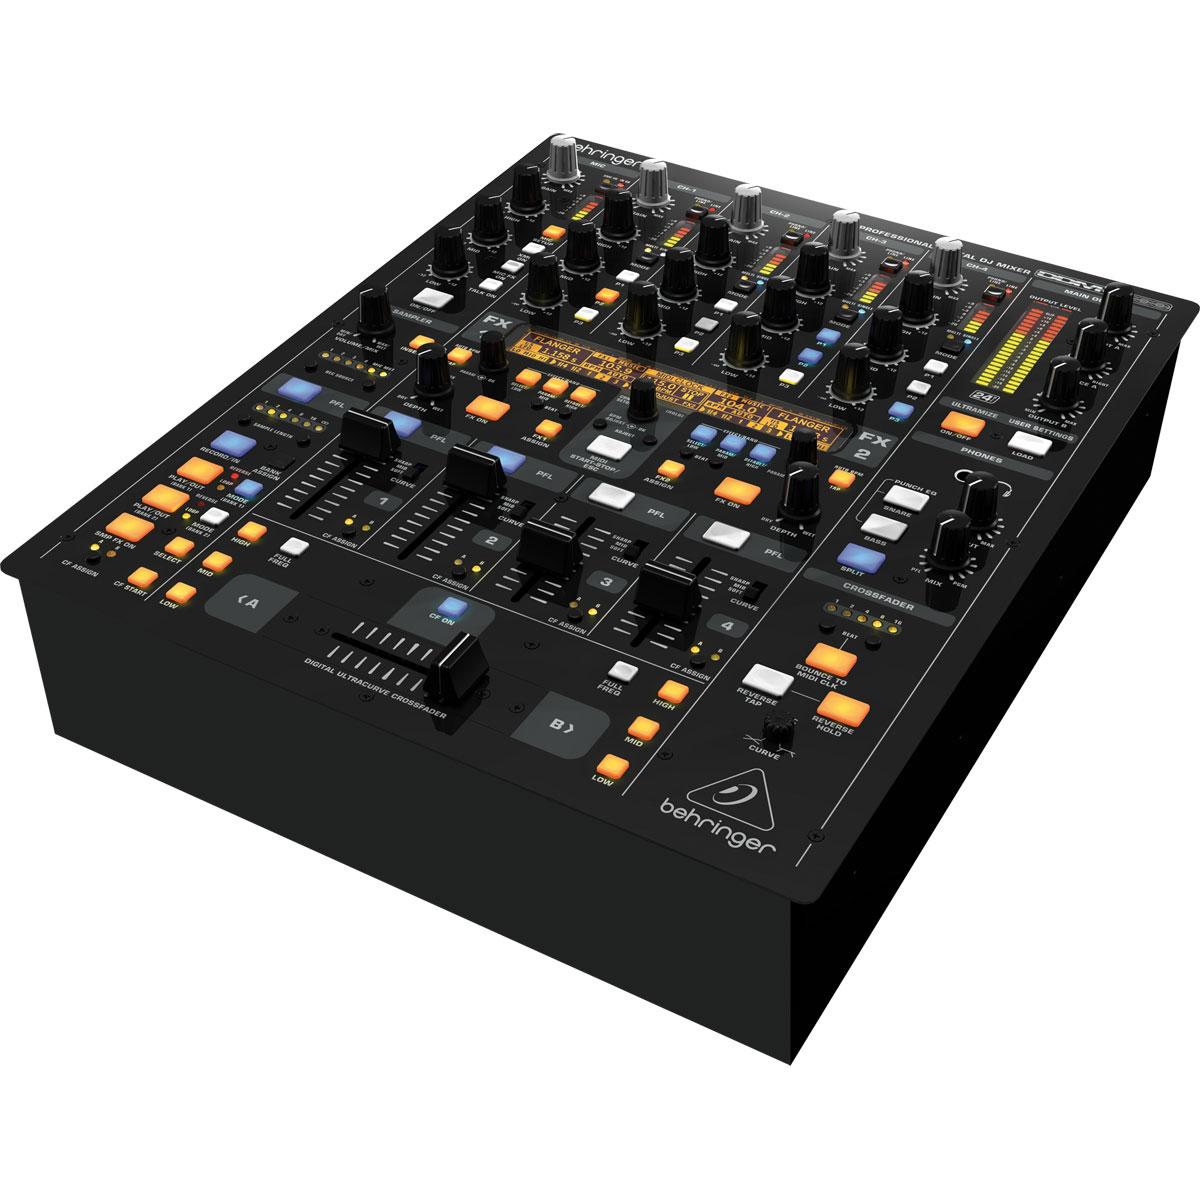 DDM4000 - Mixer DJ 5 Canais Digital DJ Mixer DDM 4000 - Behringer